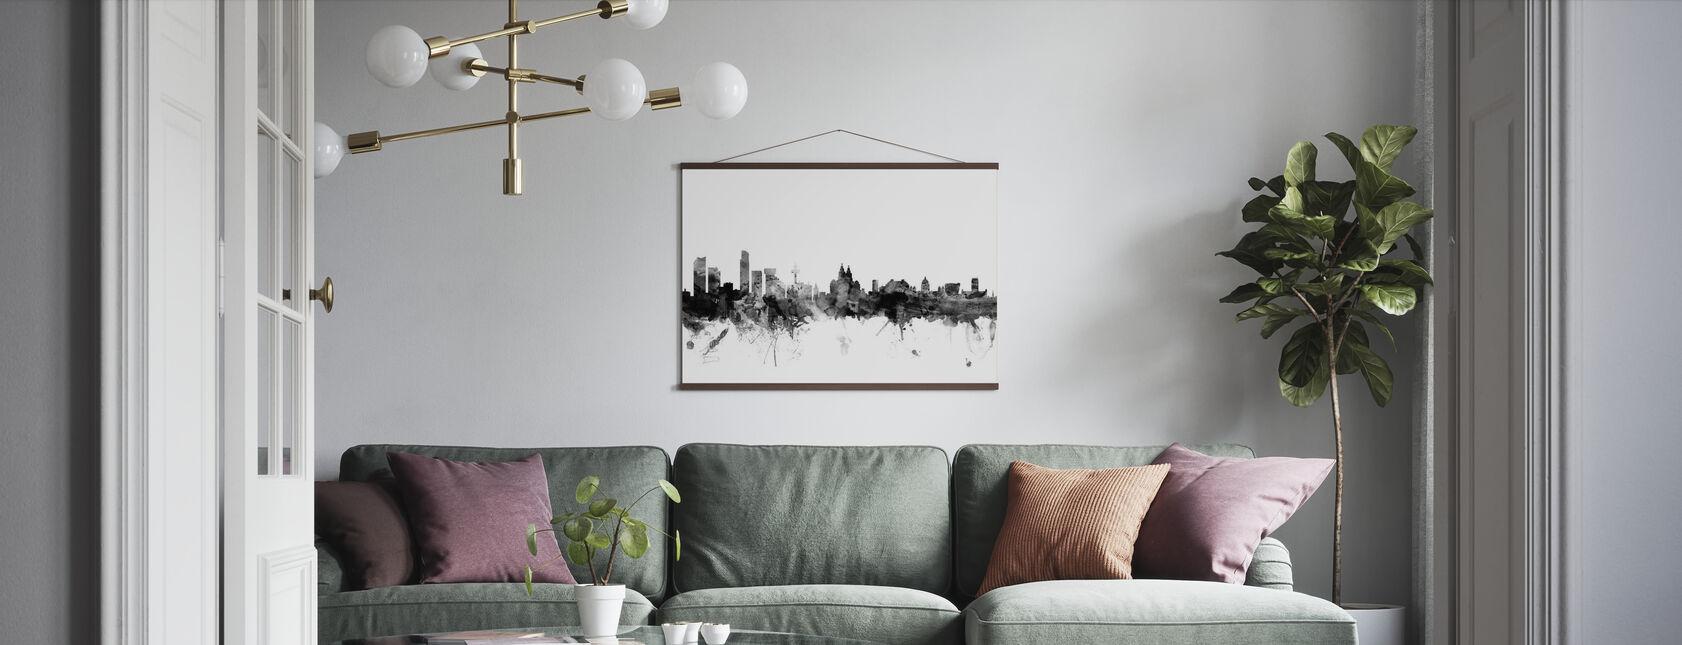 Liverpool UK Skyline svart - Plakat - Stue